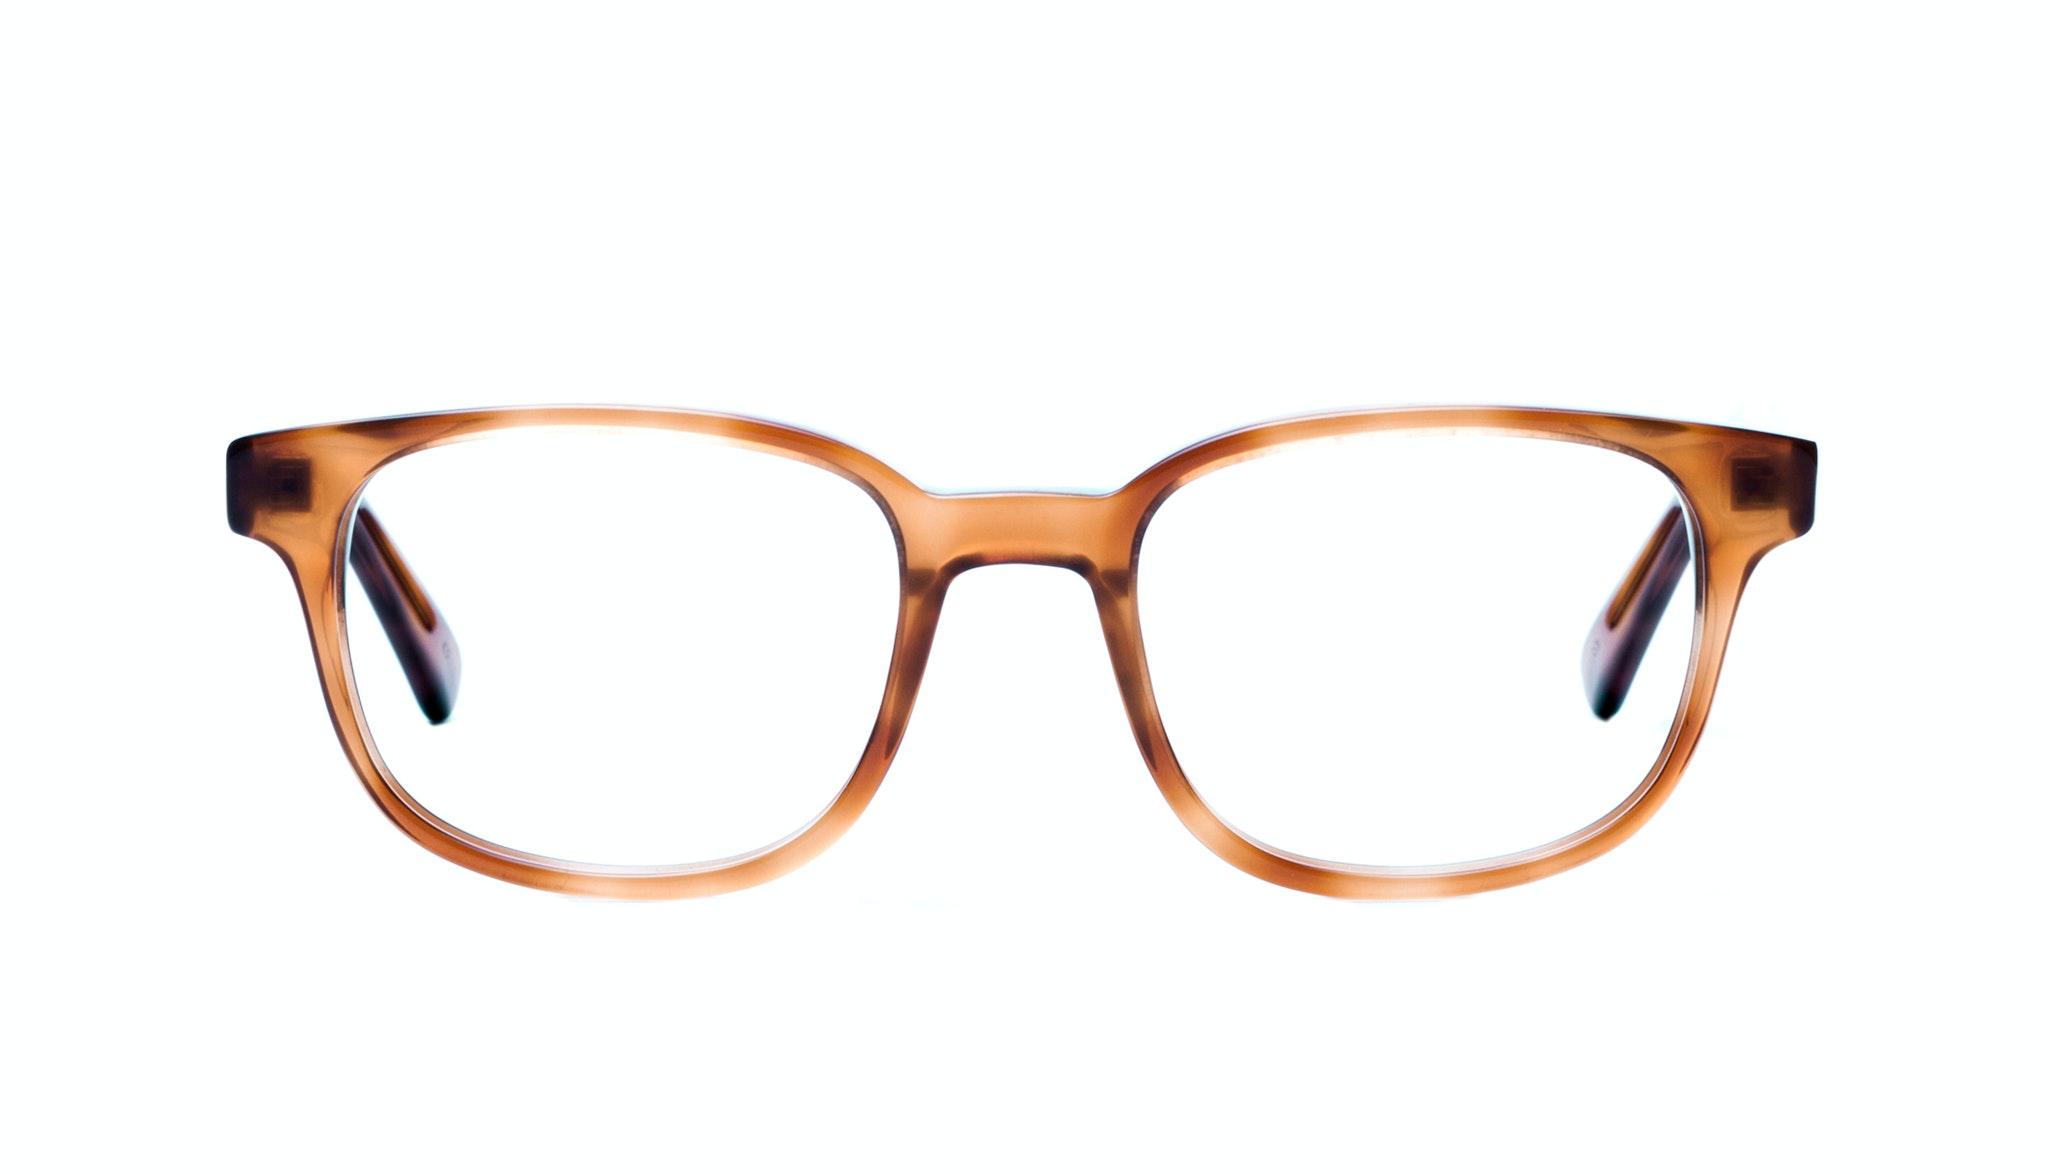 Affordable Fashion Glasses Rectangle Square Eyeglasses Men Women Magnetic Havana Front